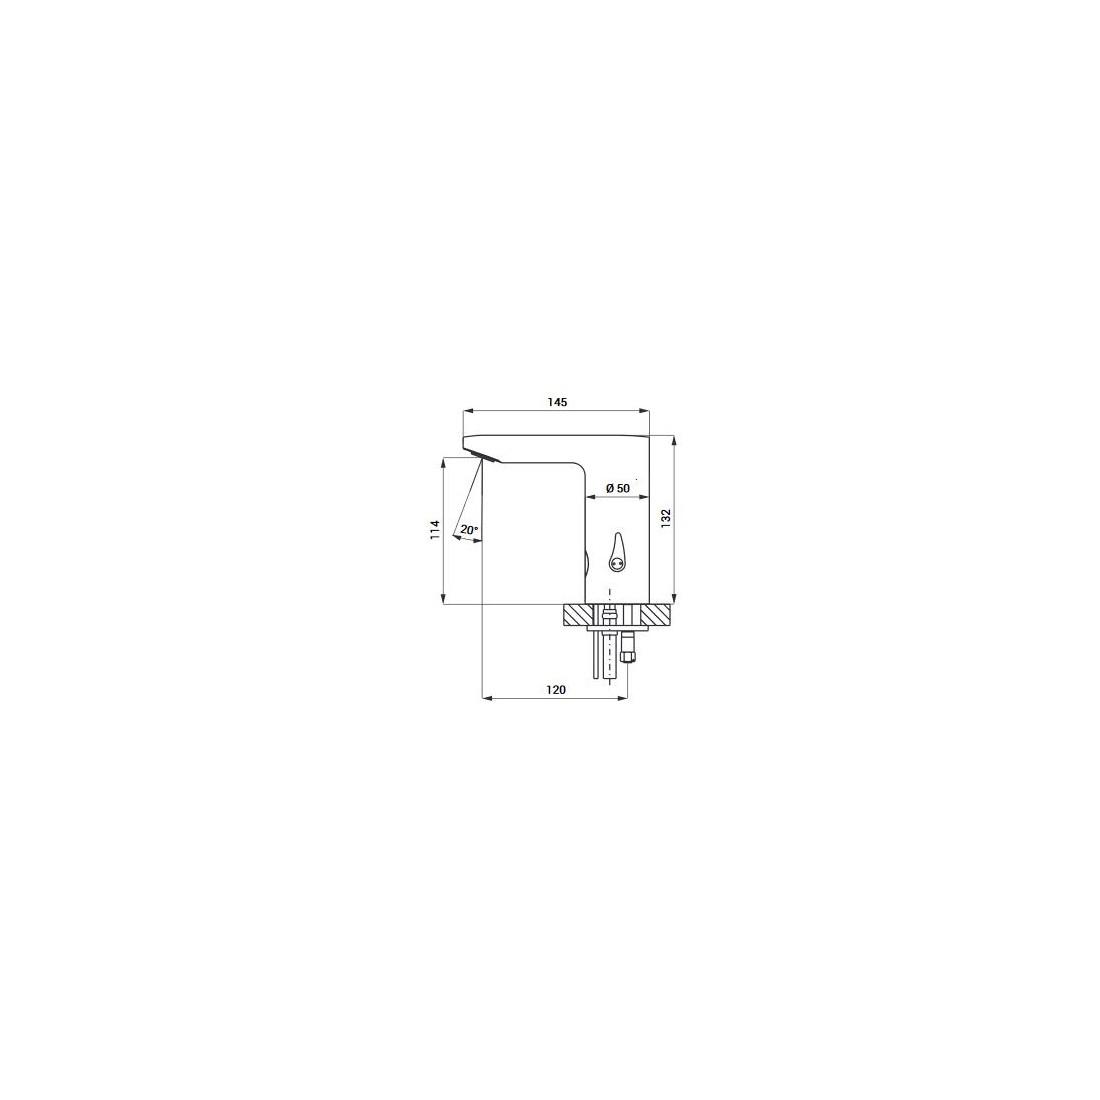 Praustuvo maišytuvas Sanela SLU 54 su integruota elektronika, 24 V DC